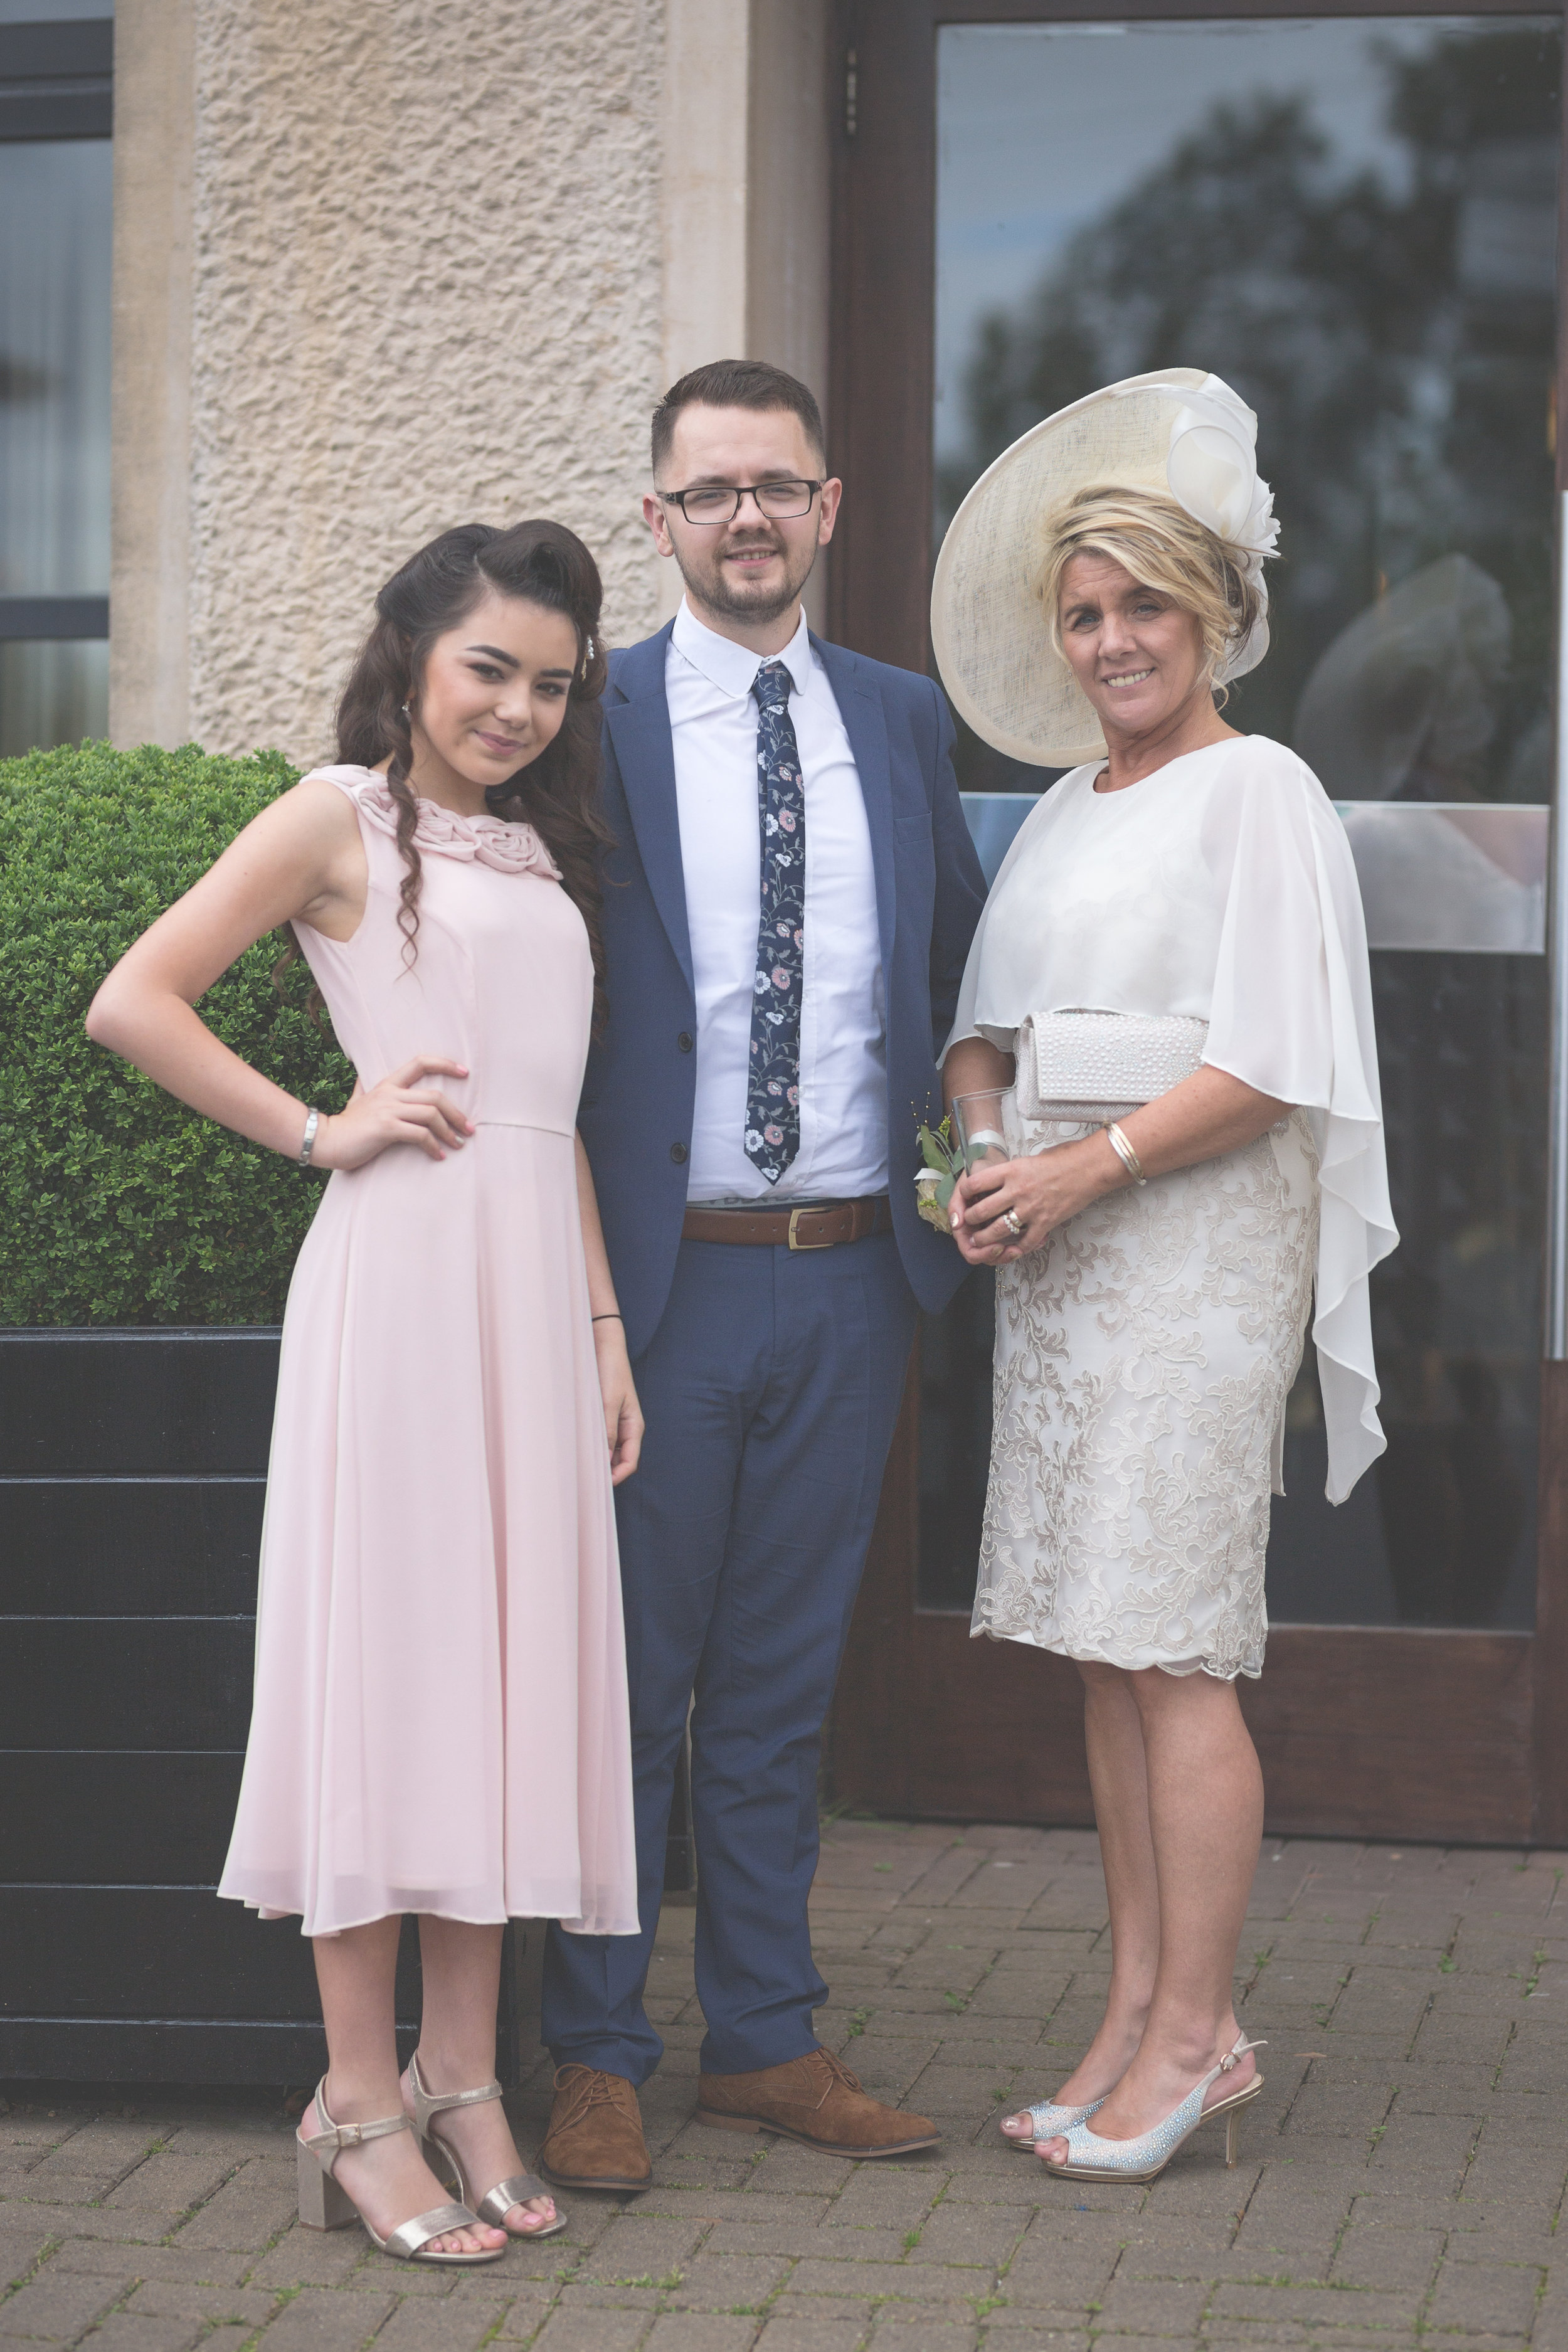 Antoinette & Stephen - Portraits   Brian McEwan Photography   Wedding Photographer Northern Ireland 42.jpg